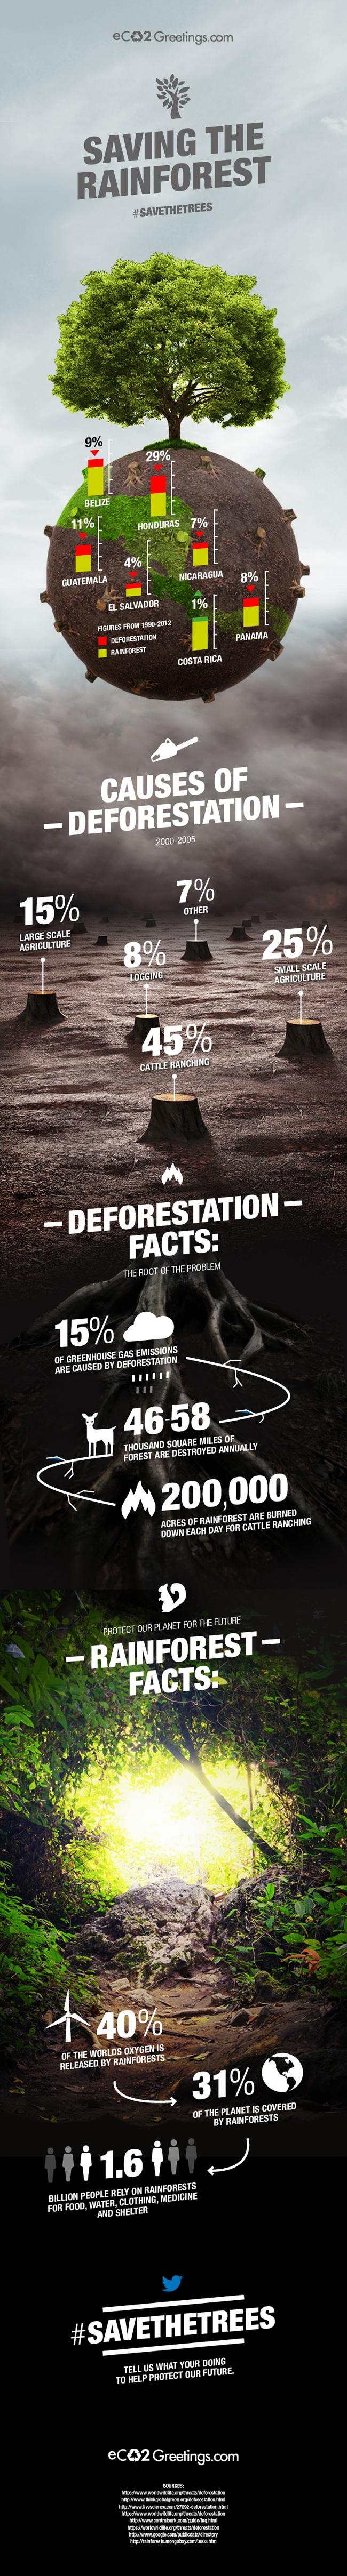 eco2-infographic-deforestation